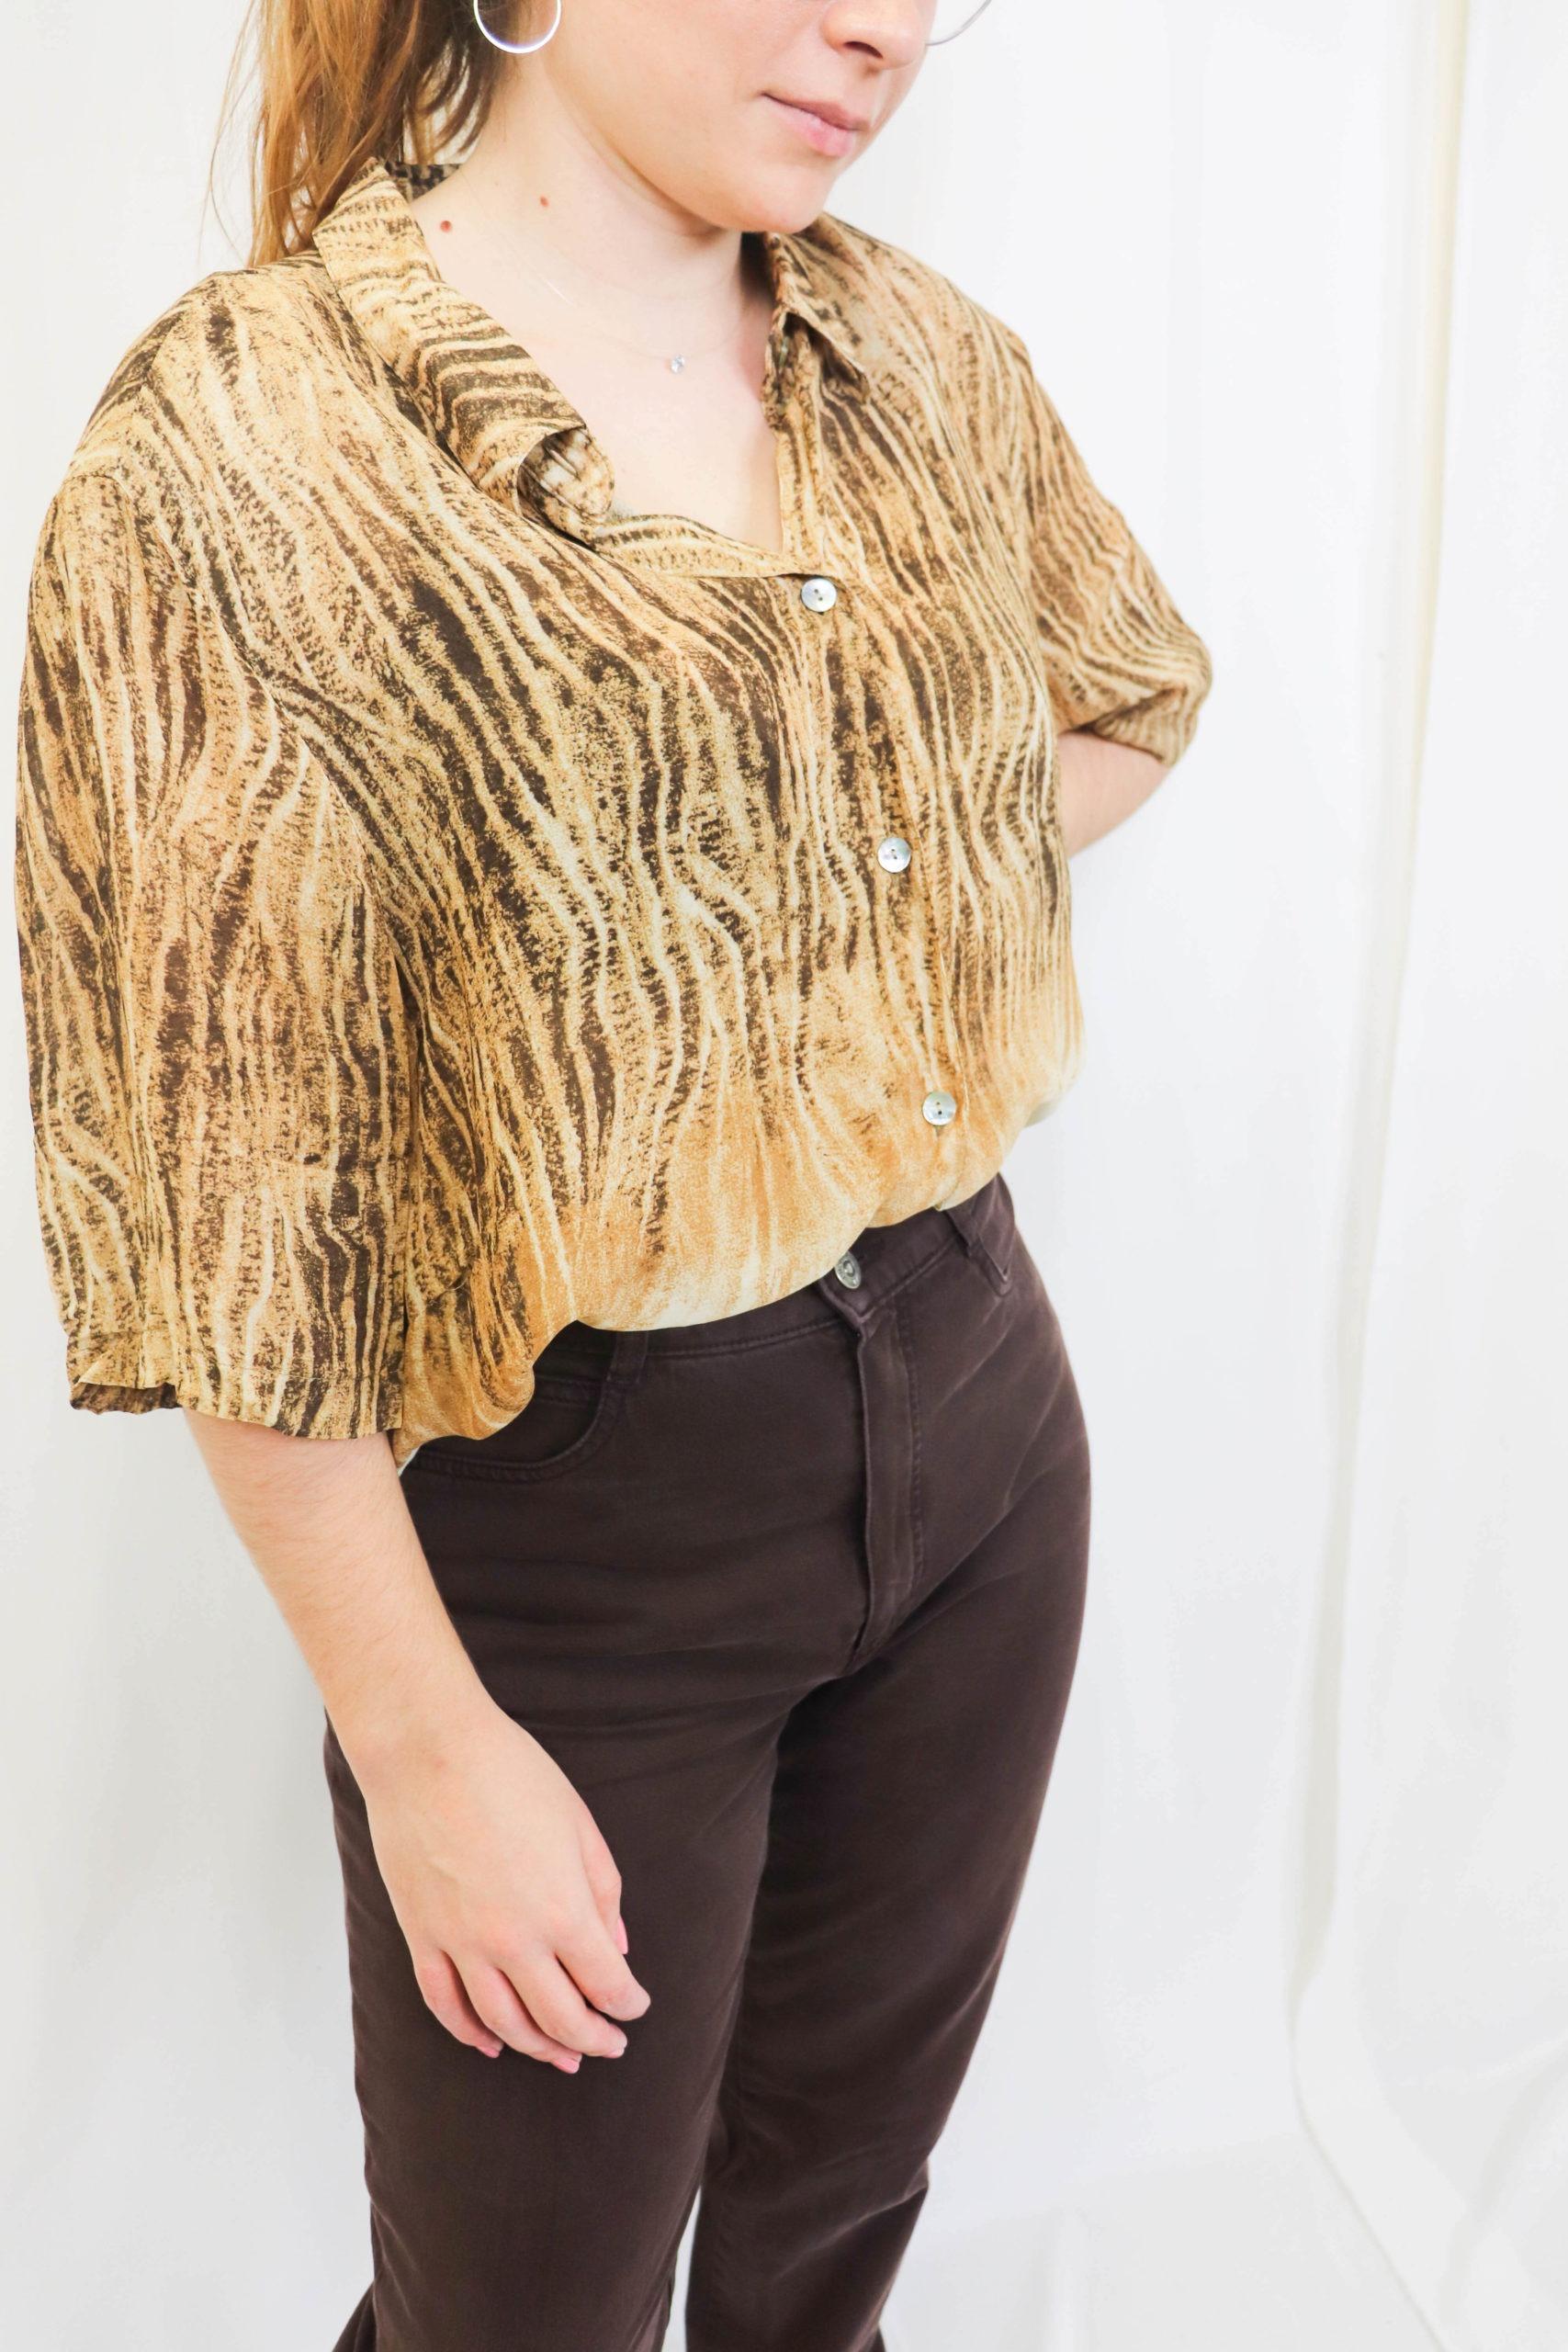 chemise-manches-courtes-motif-animal (5)